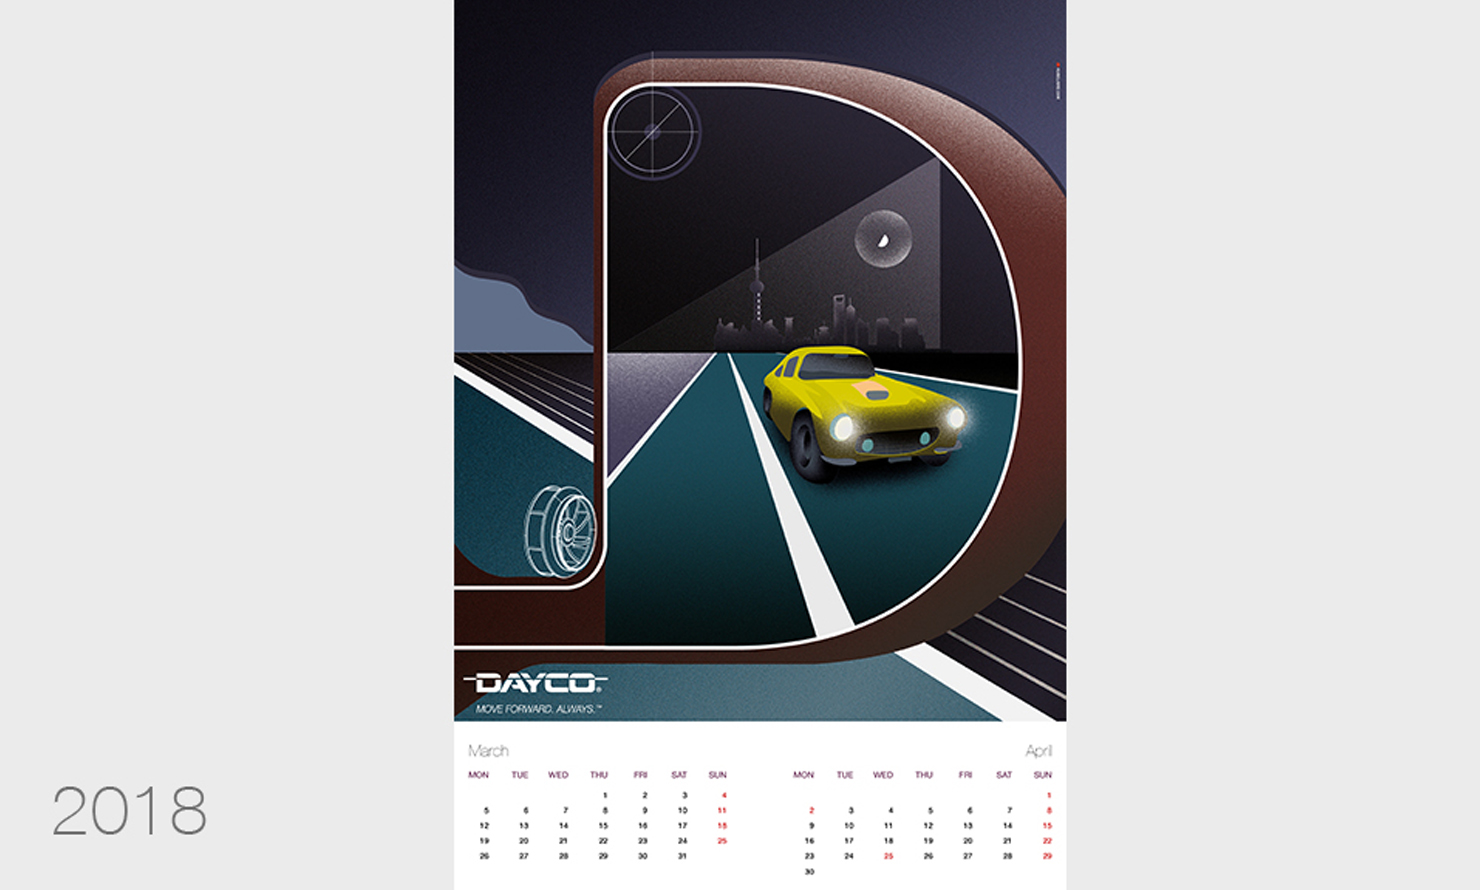 https://www.kubelibre.com/uploads/Slider-work-tutti-clienti/dayco-calendario-2018-2.jpg